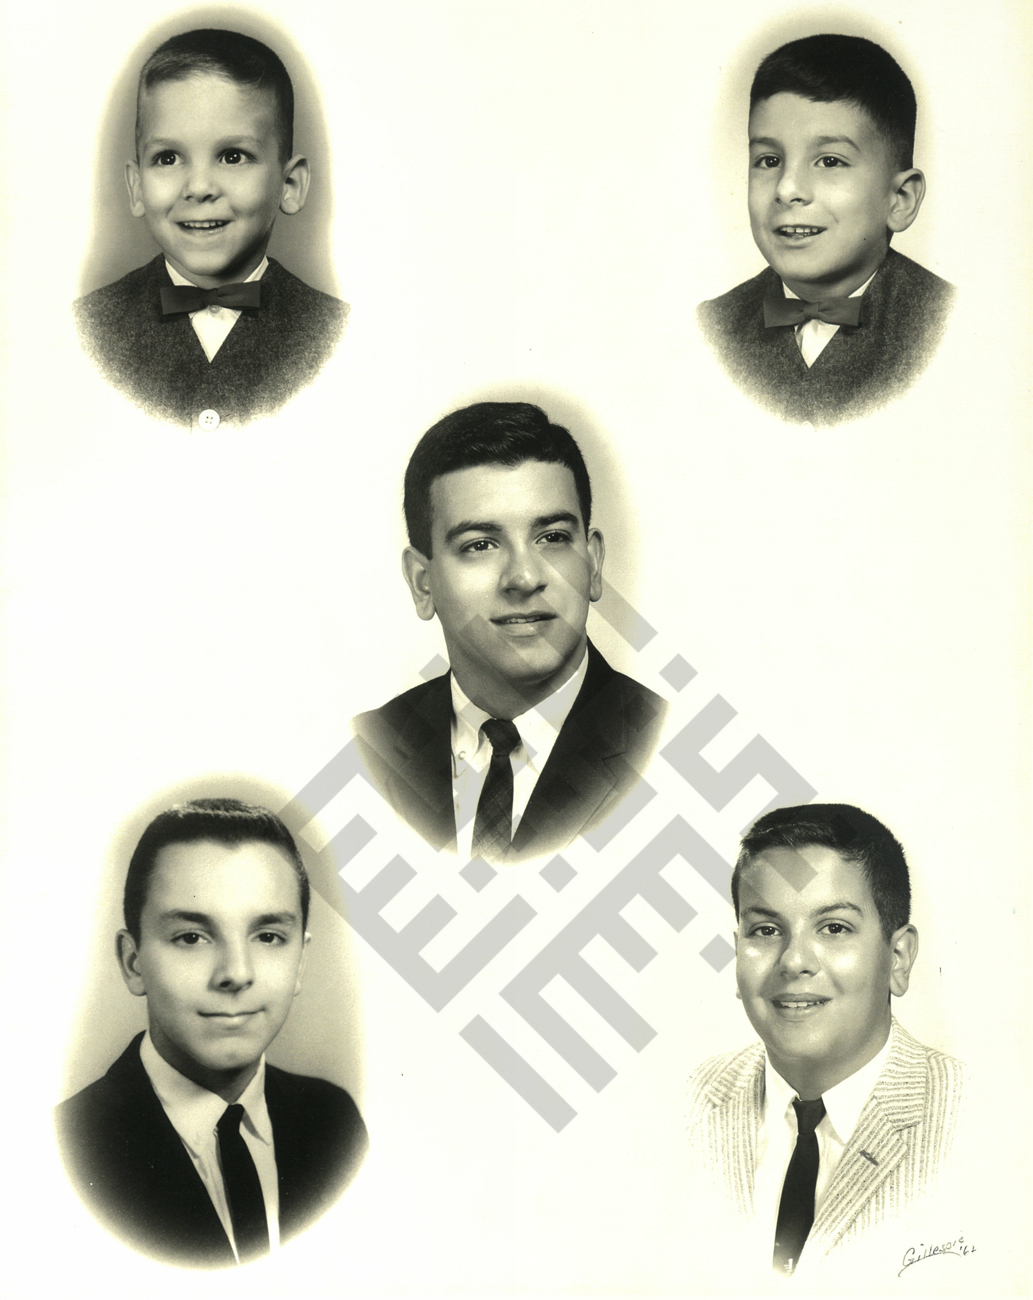 Findlen_portraits of unidentified boys_wm.jpg